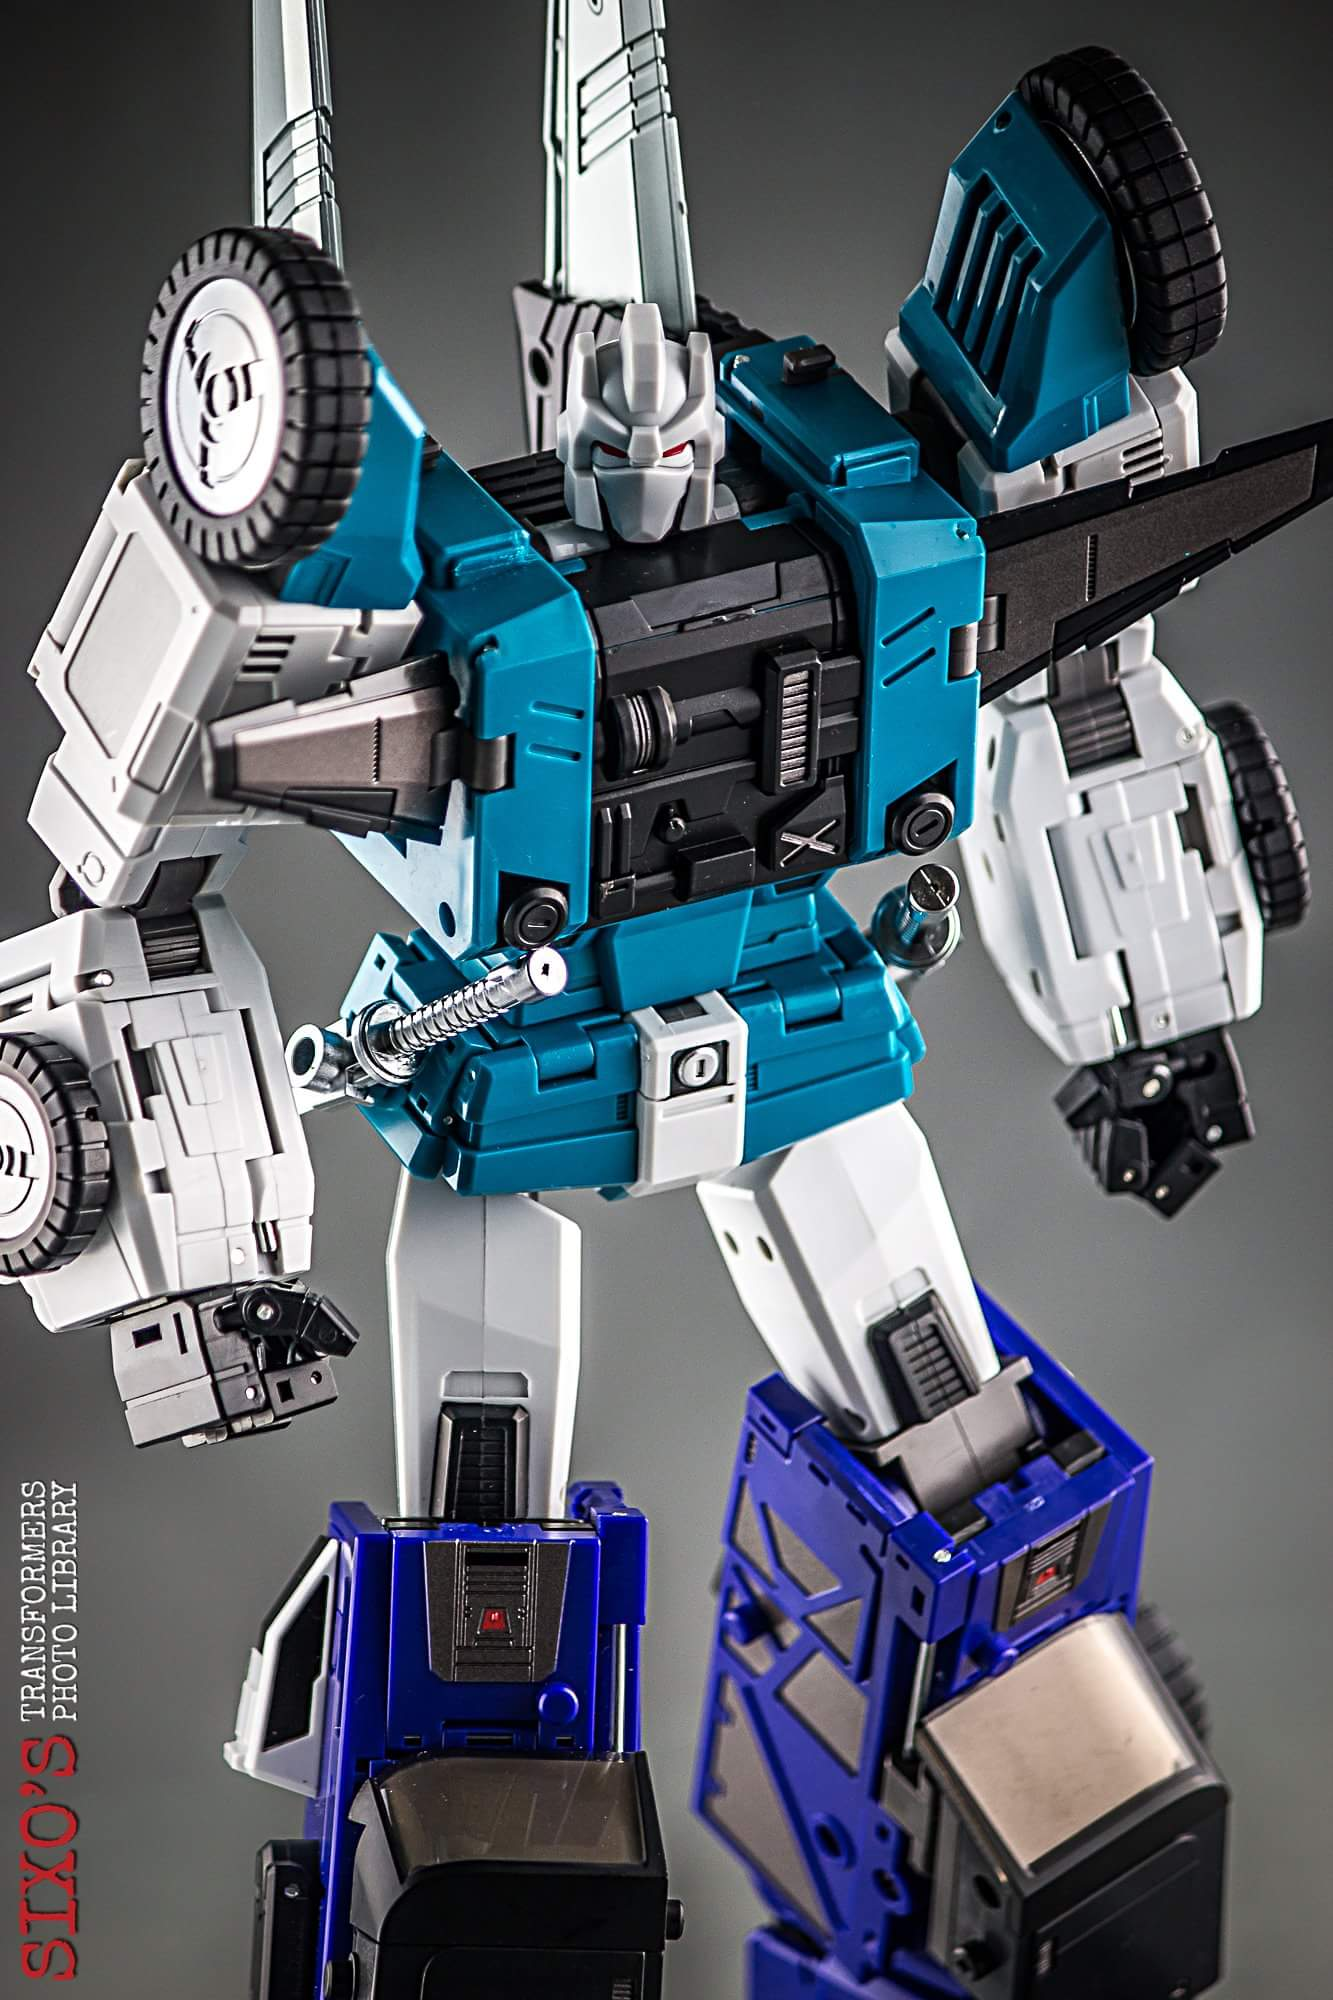 [DX9 Toys] Produit Tiers - Jouet D10 Hanzo - aka Sixshot/Hexabot - Page 2 2suhIoga